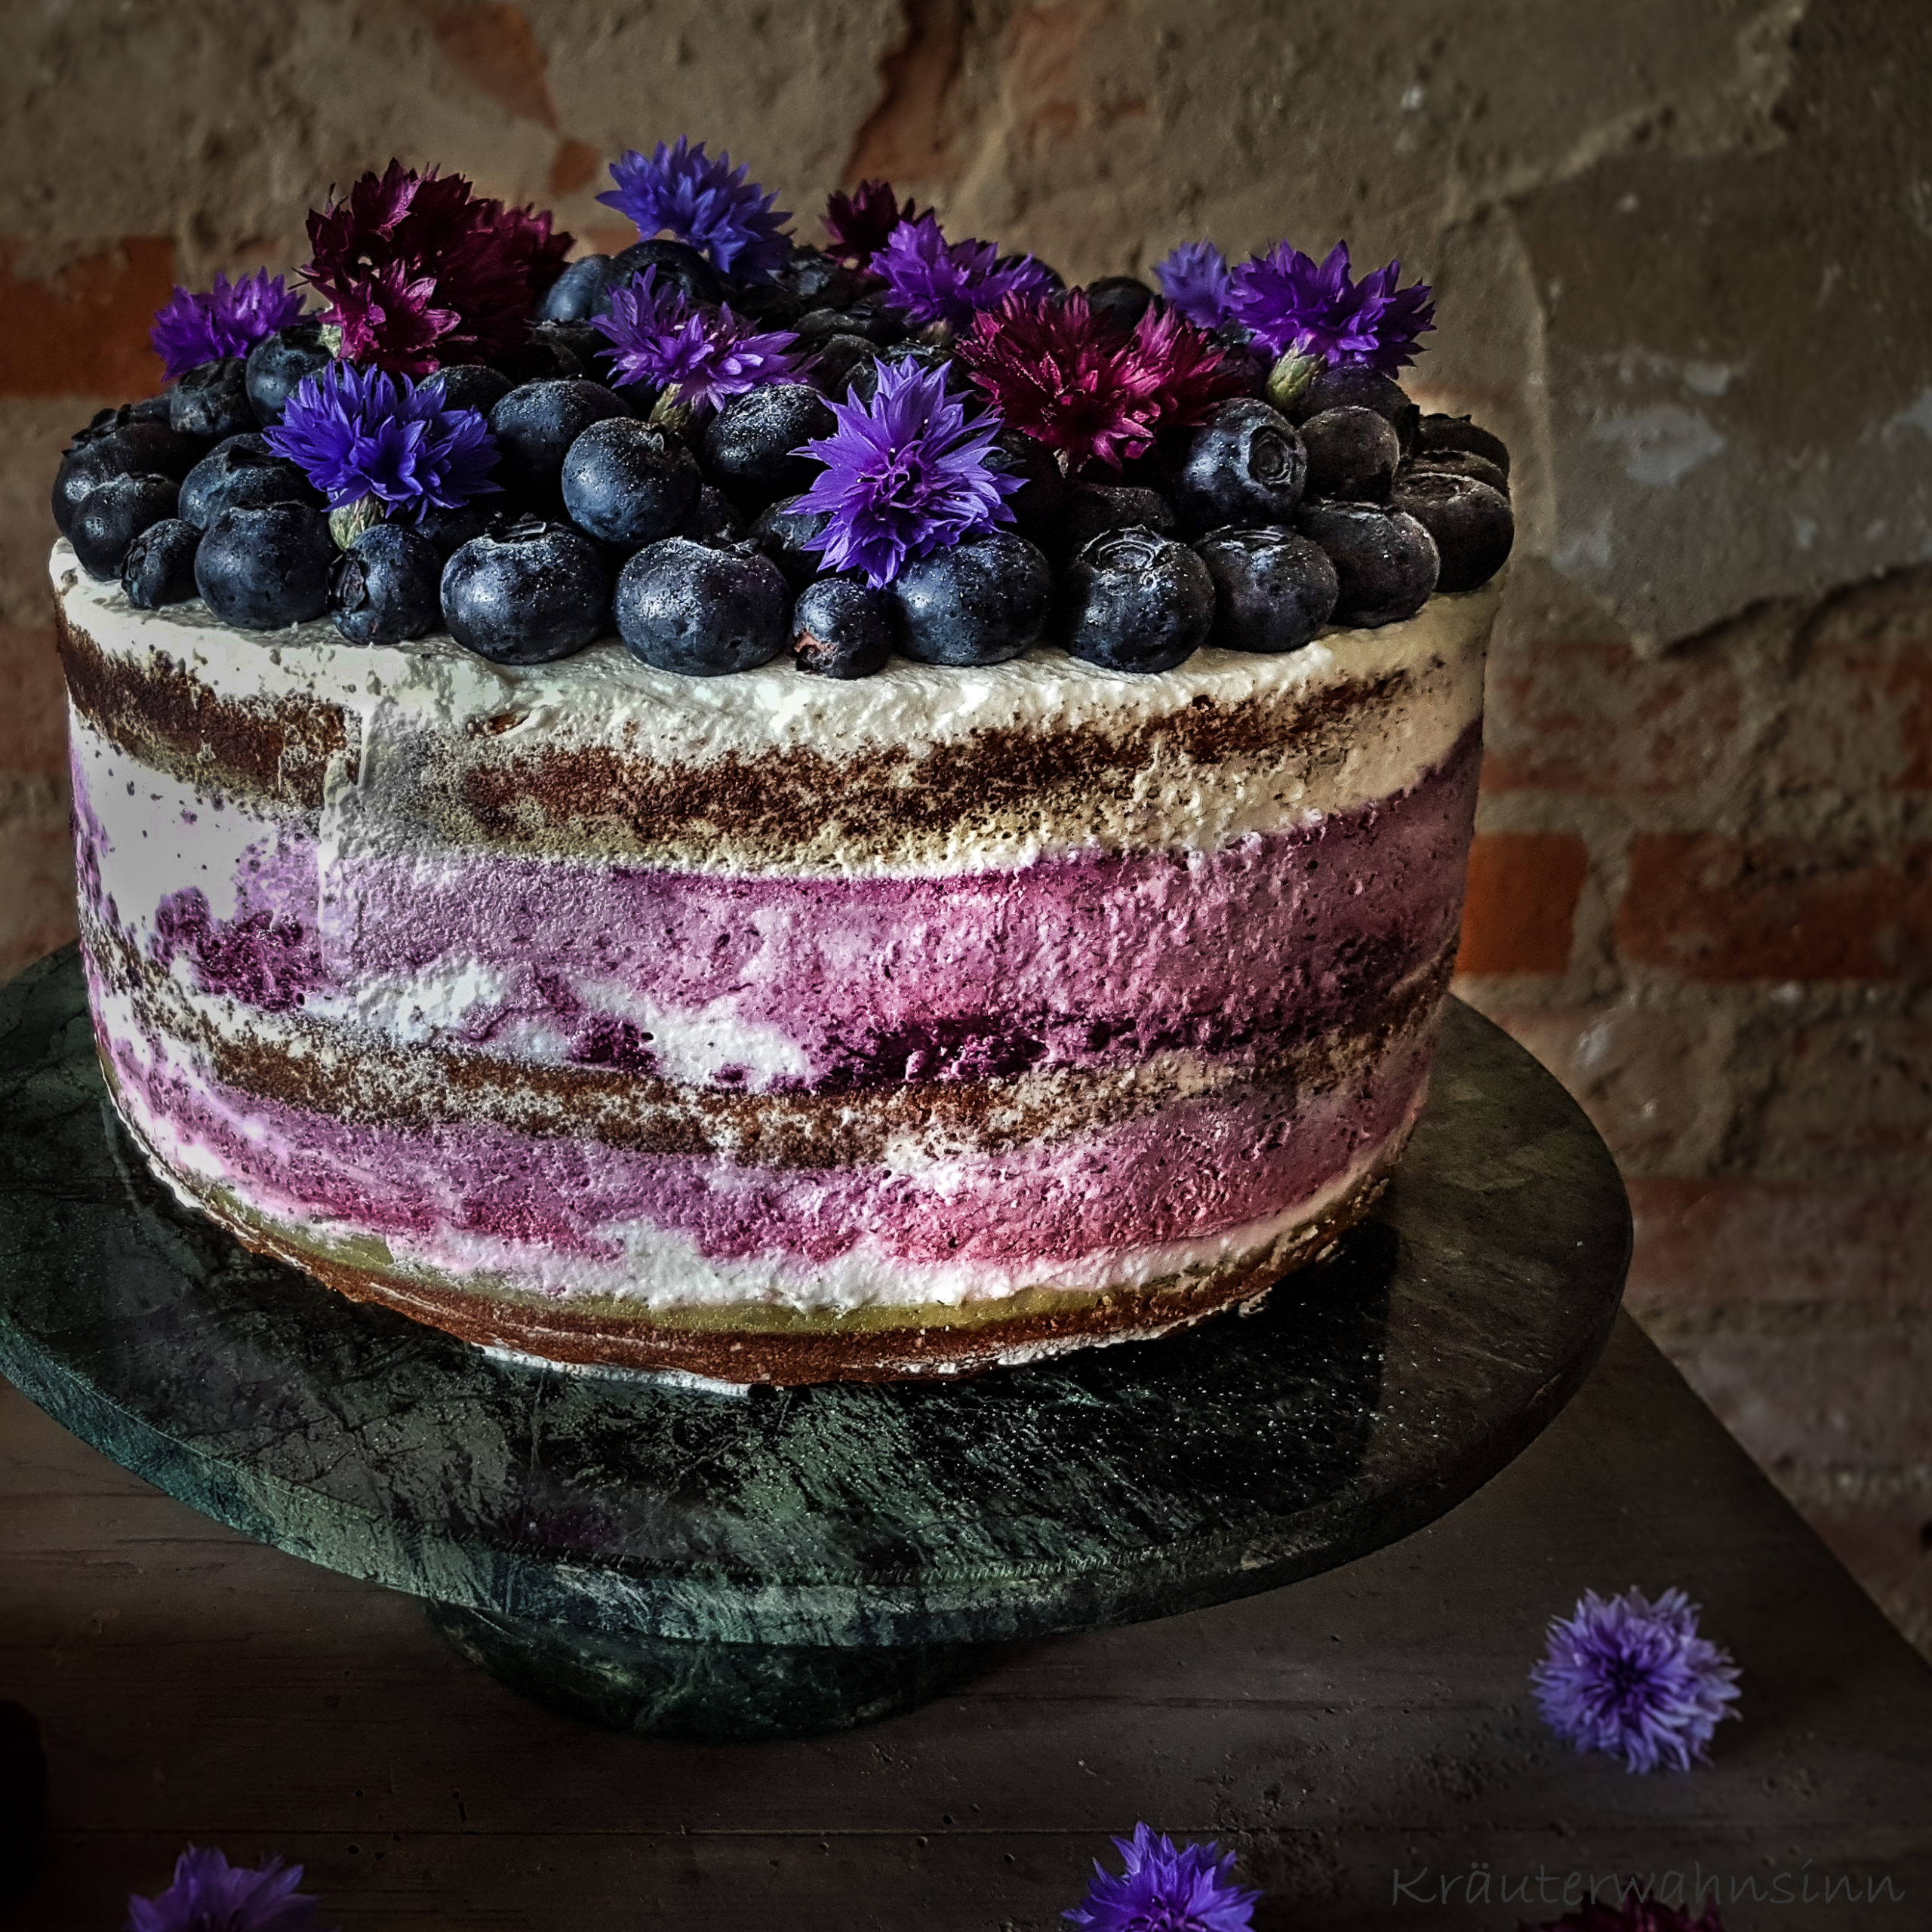 Blaubeer-Limette-Mascarpone-Torte